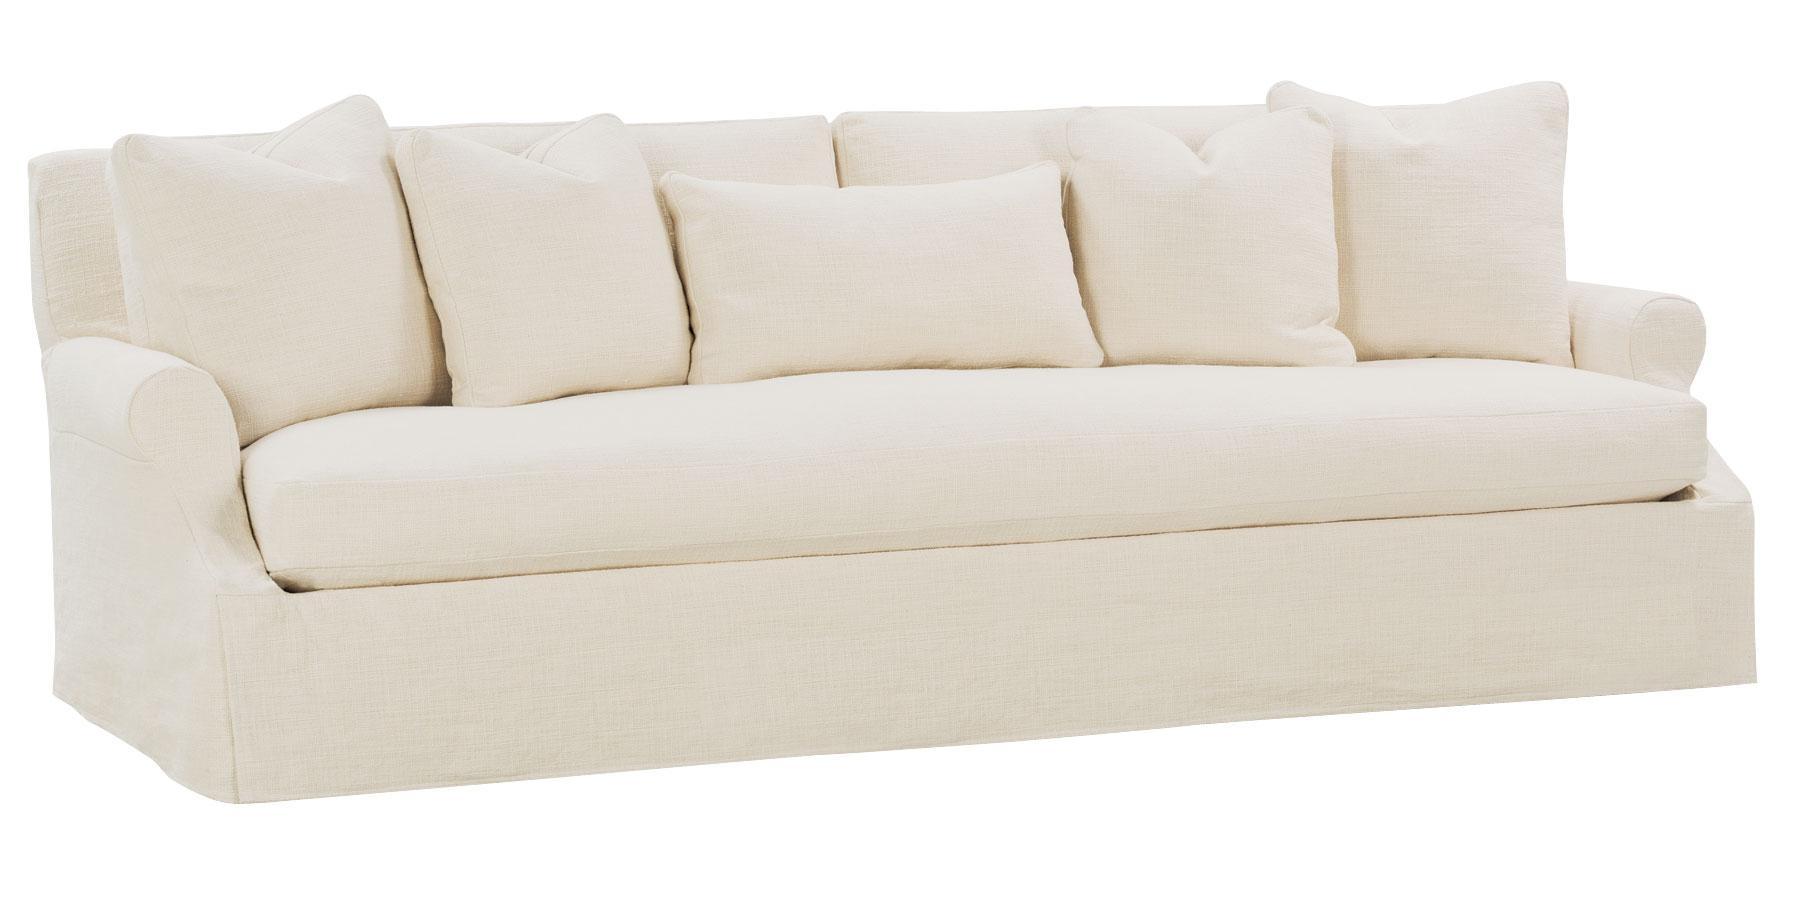 Interior Design Washable Slipcovered Sofas Washable Slipcovered Pertaining To Washable Sofas (Image 8 of 20)